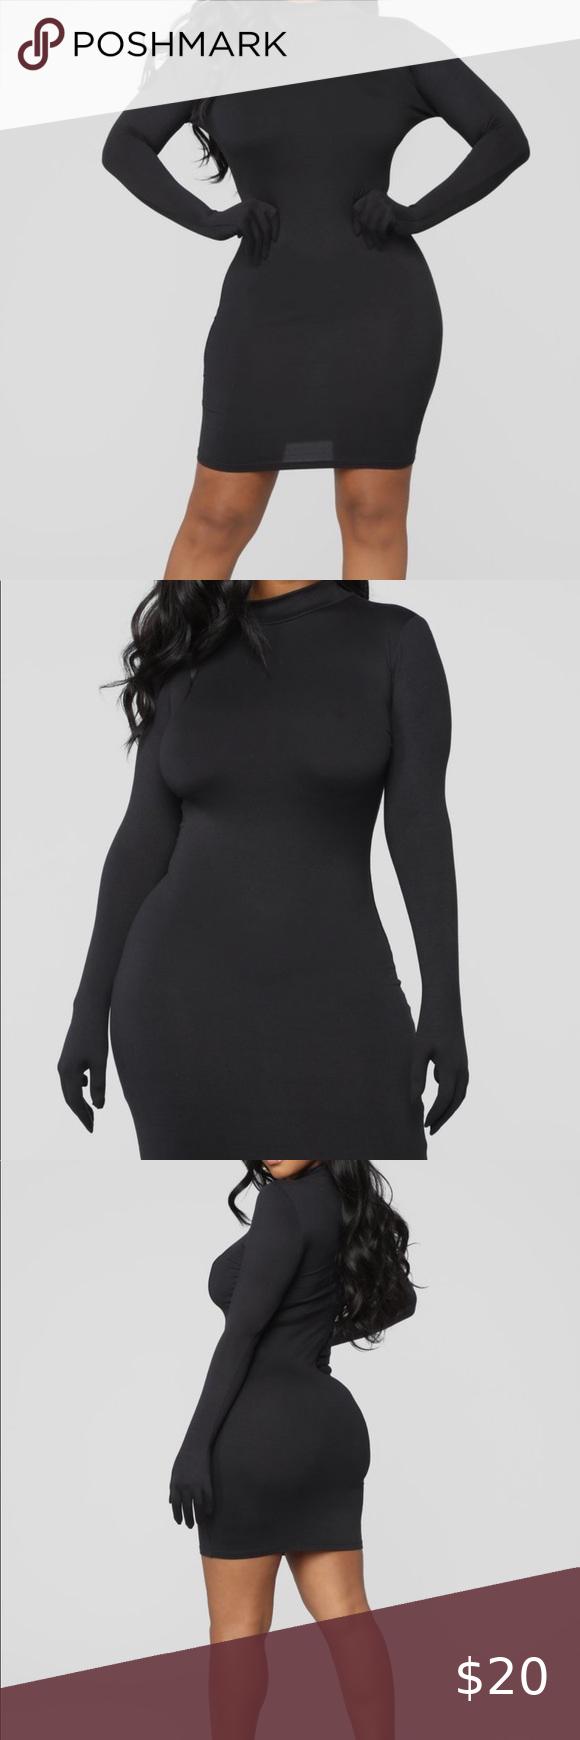 Fashionnova Black Dress Dress With Gloves Fashion Nova Fashion Nova Dress [ 1740 x 580 Pixel ]